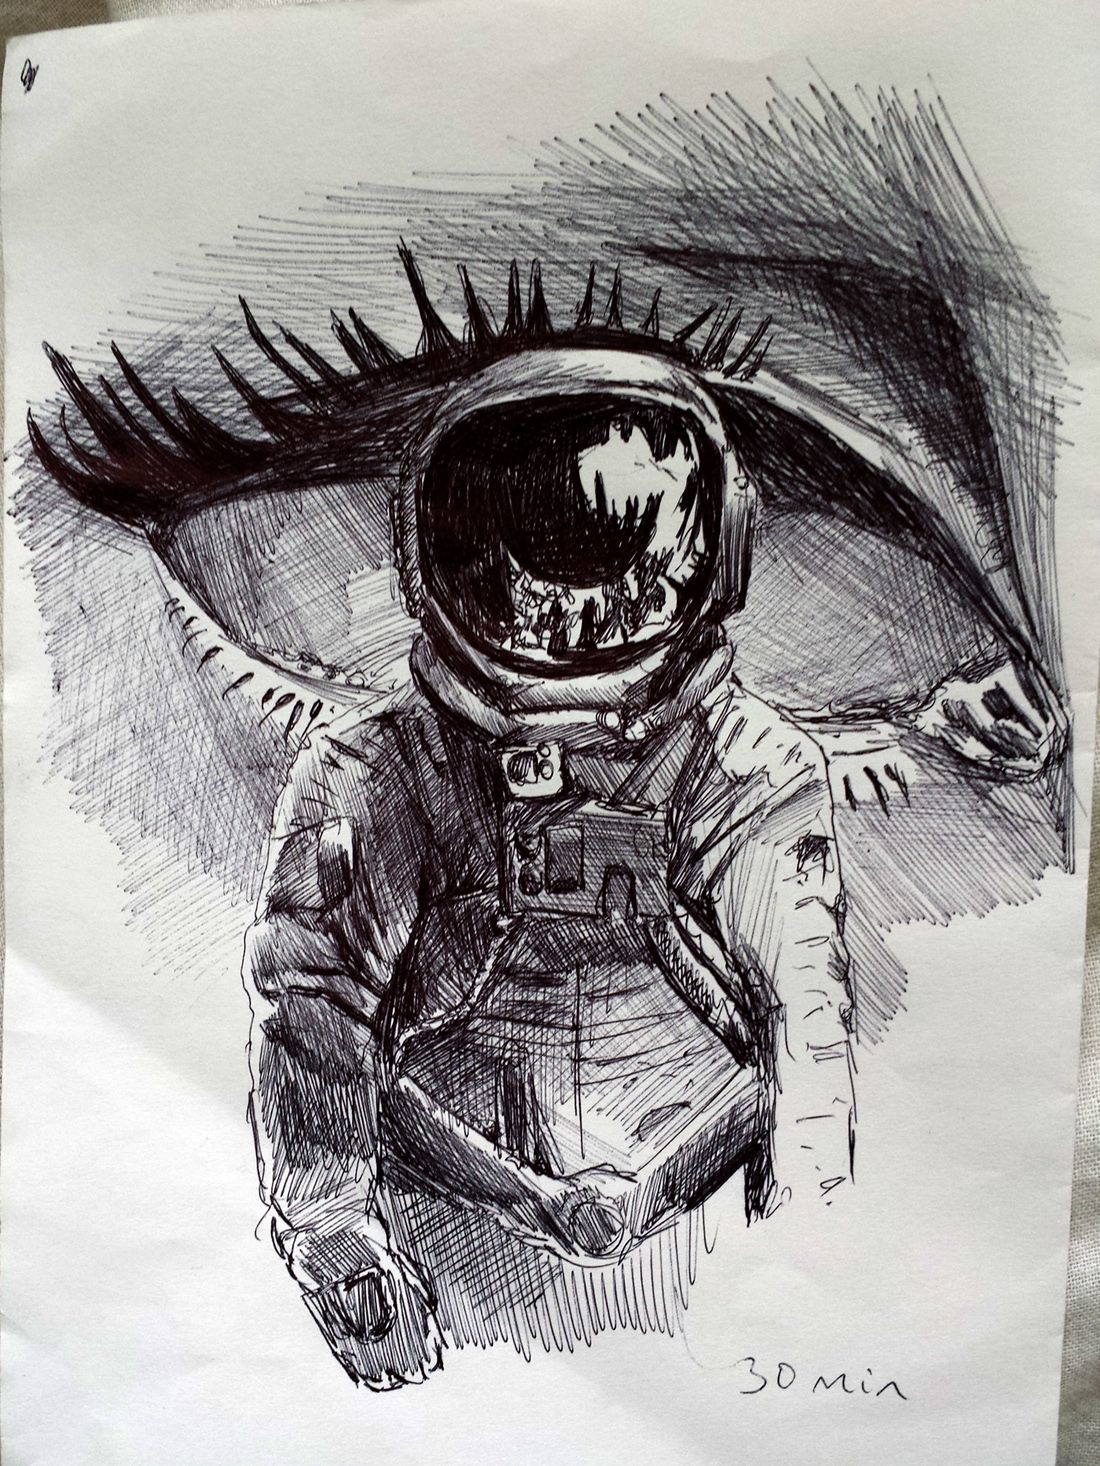 Tumblr hipster art astronuta ojo a lapiz dibujo for Cool art sketches